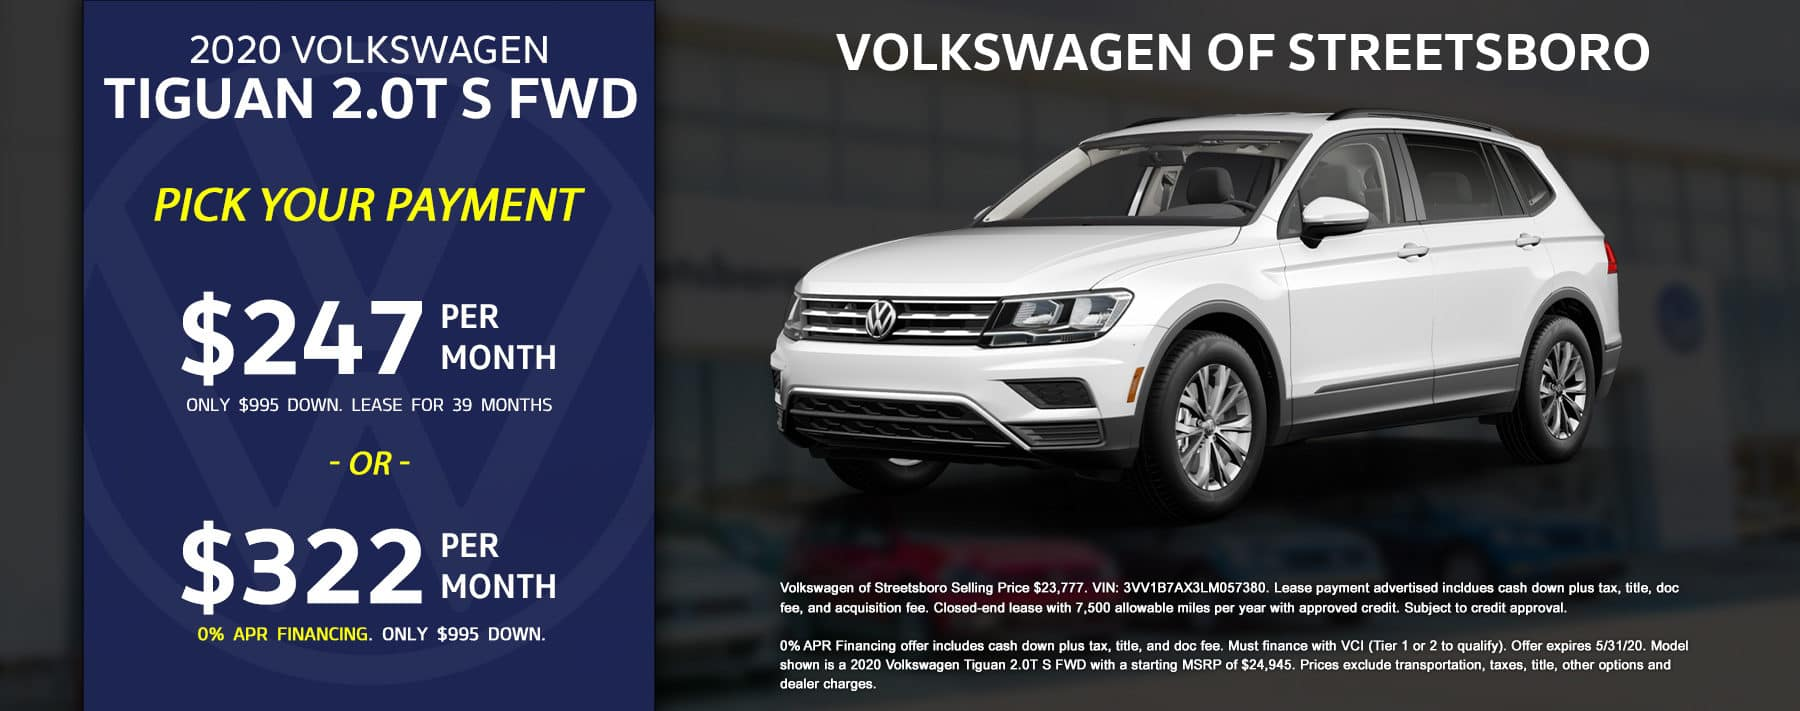 2020 VW Tiguan - May 2020